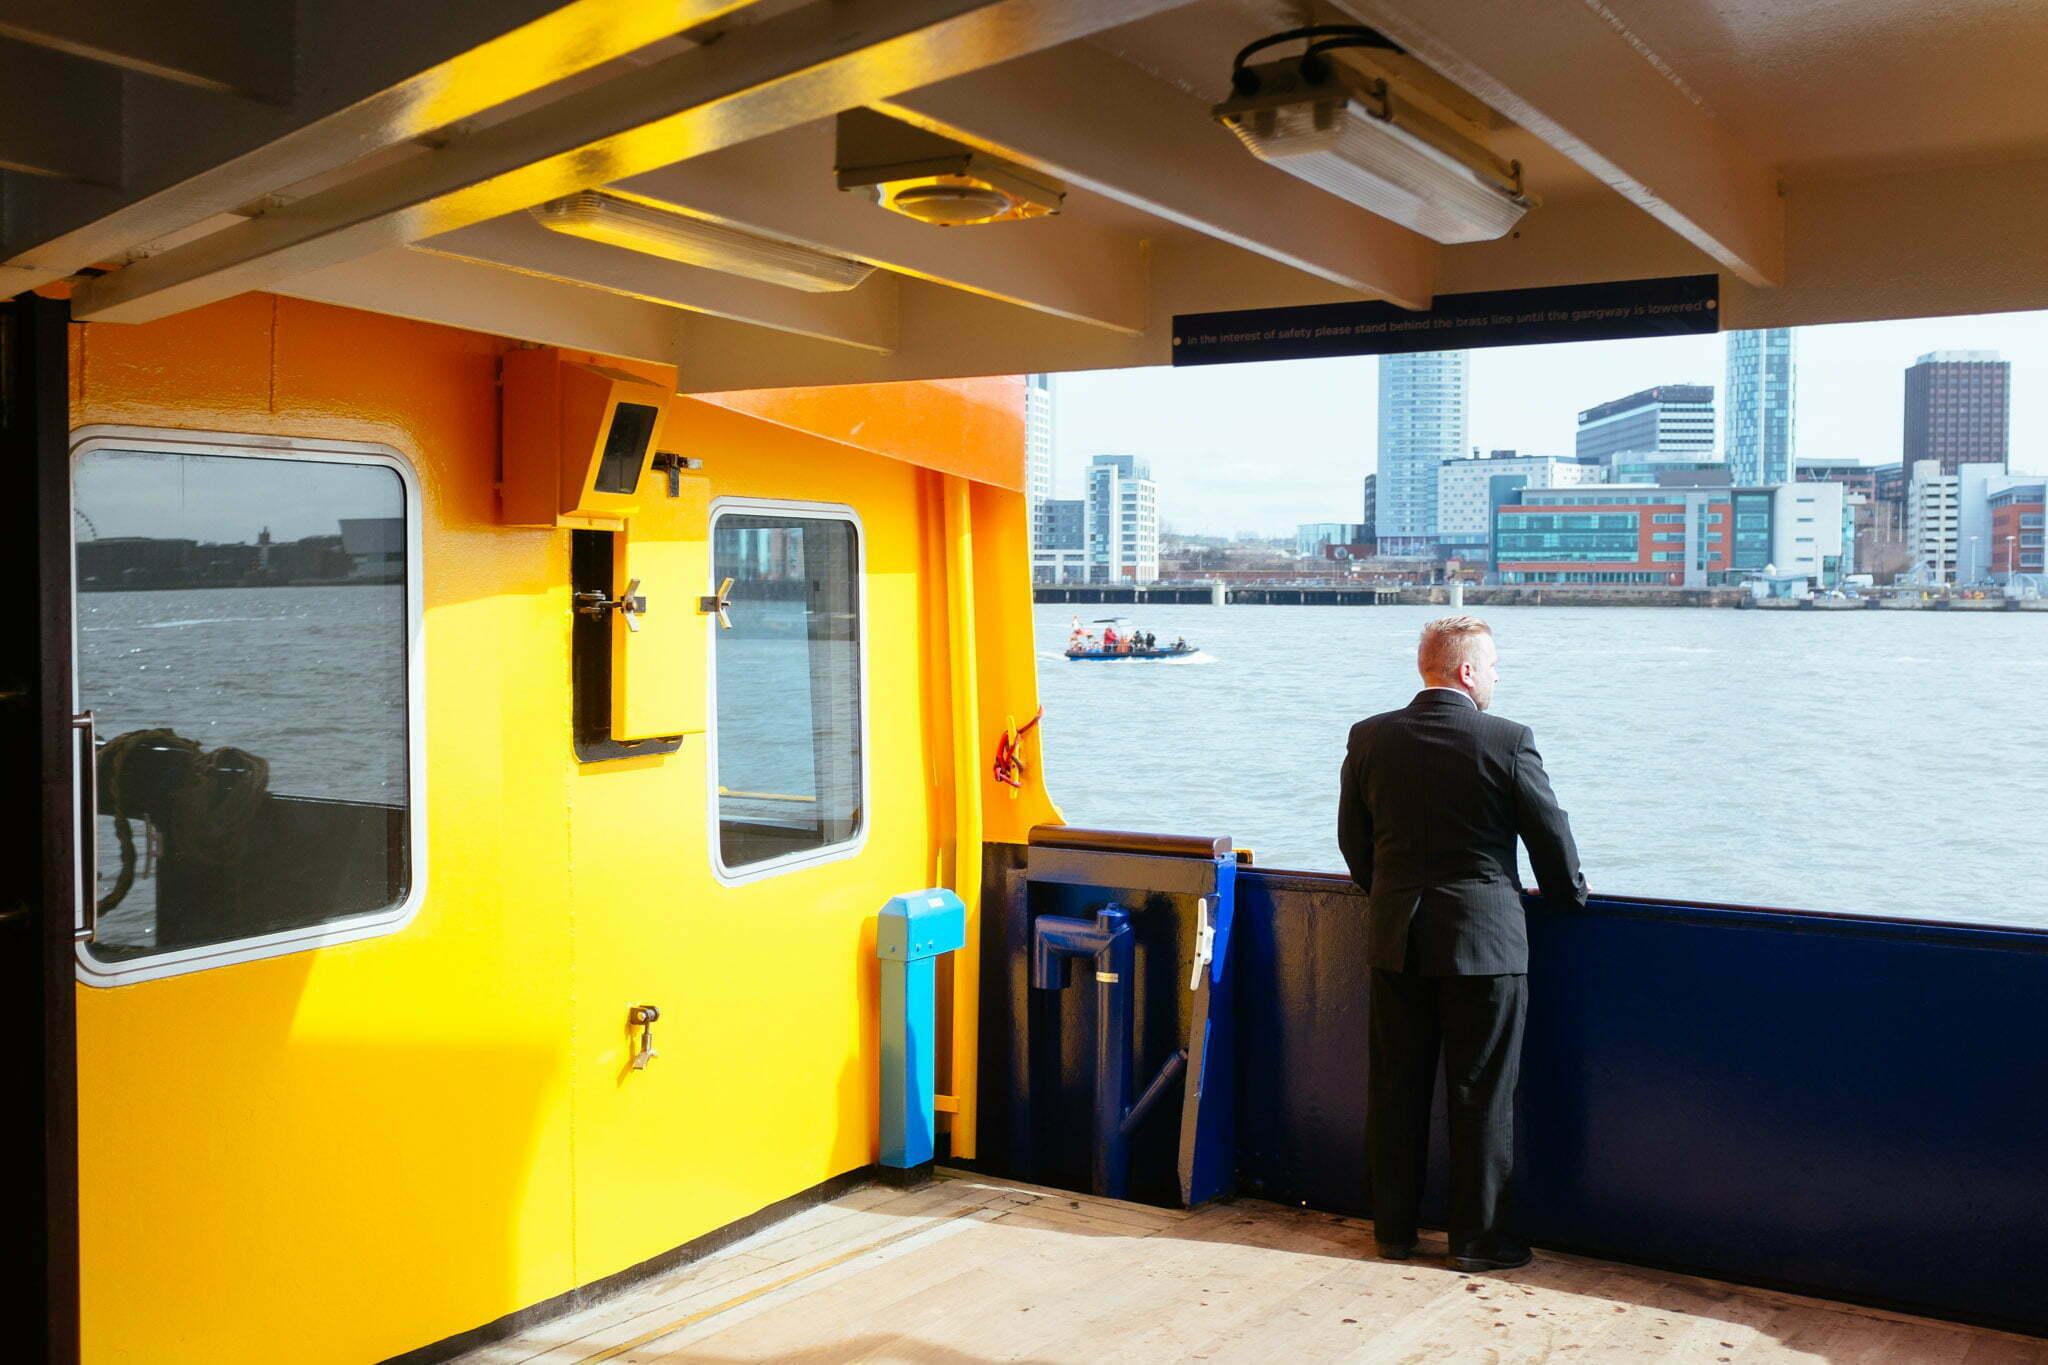 dazzle-ferry-liverpool-6330